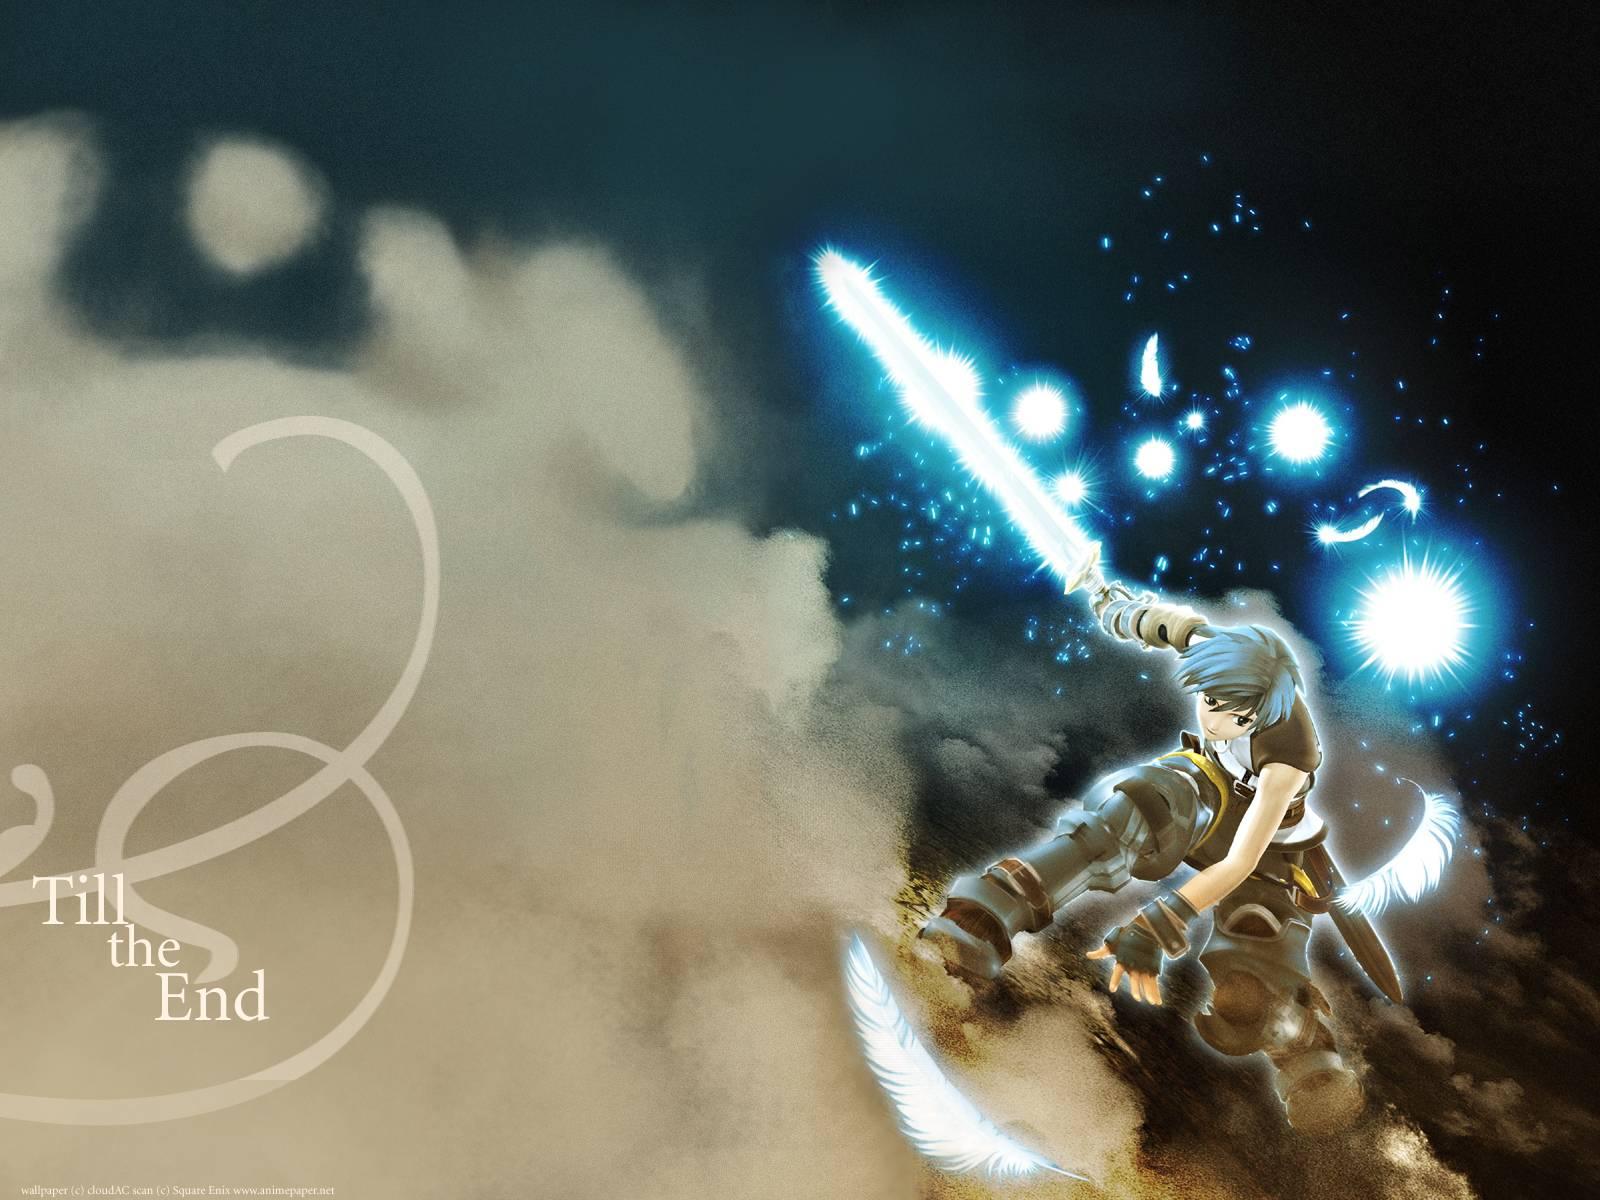 Fate Linegod Fayt Leingod Feathers Star Ocean Star Ocean 3 Sword